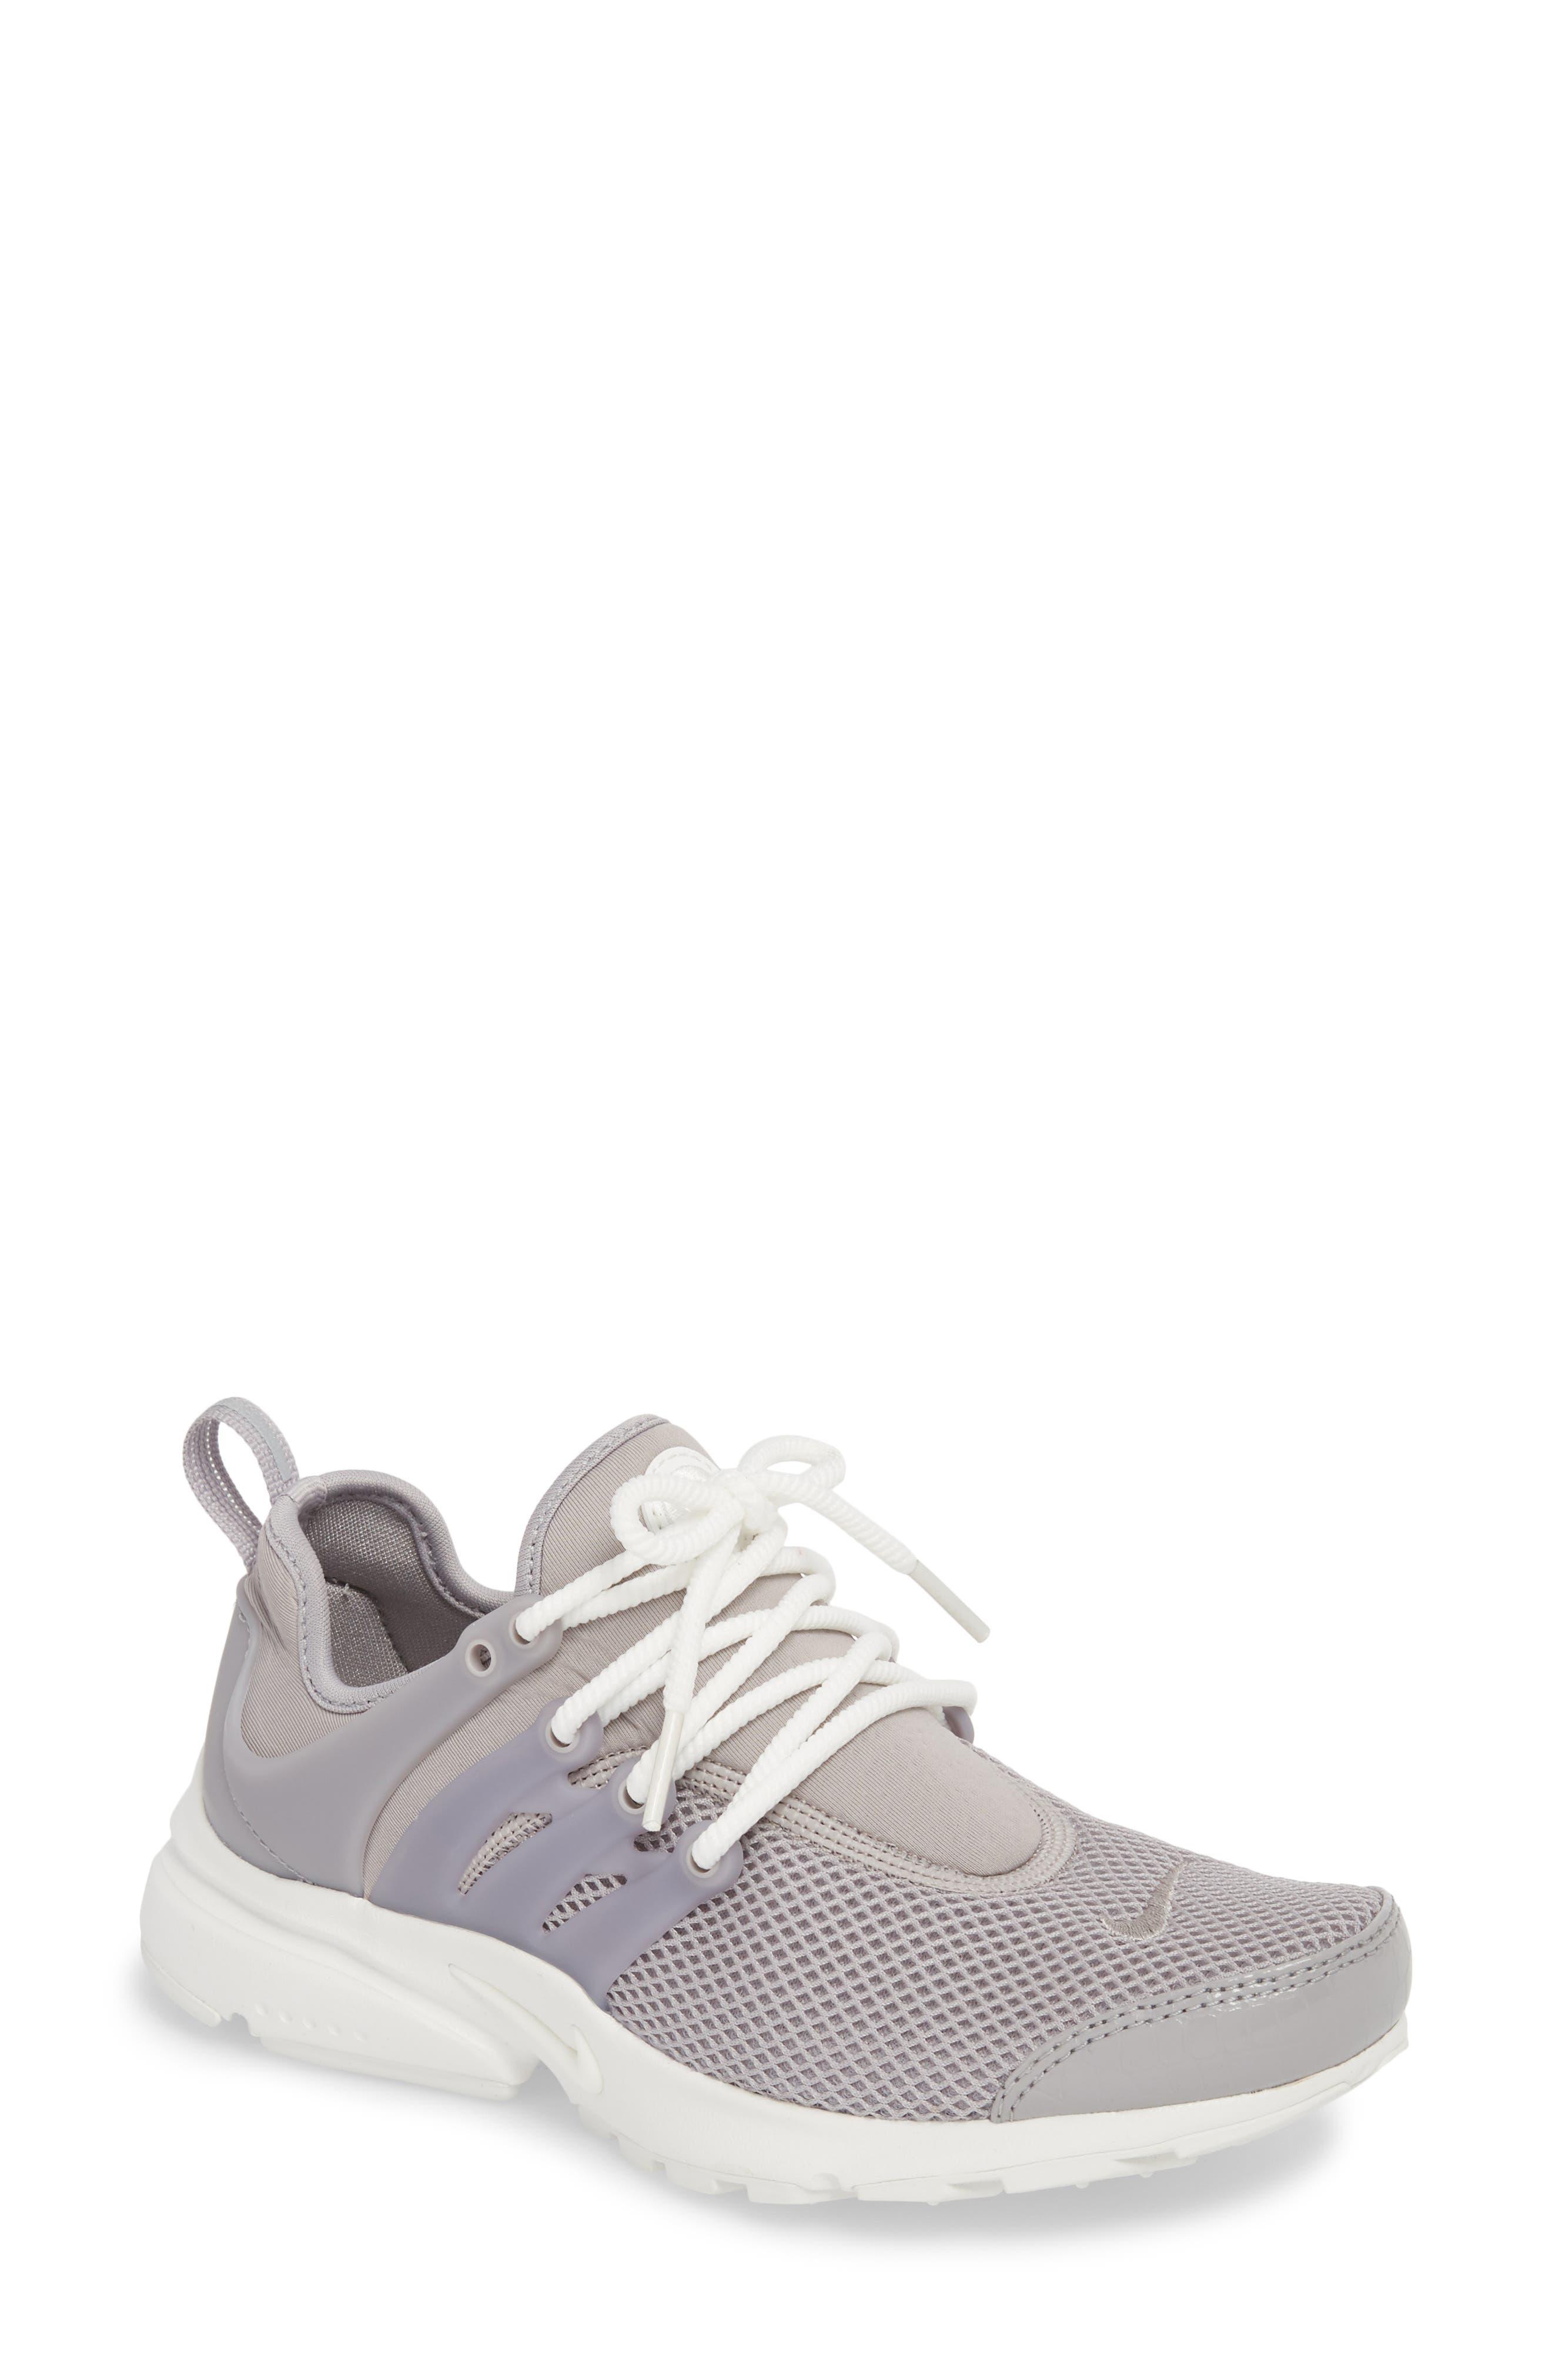 Air Presto SE Sneaker,                             Main thumbnail 1, color,                             021